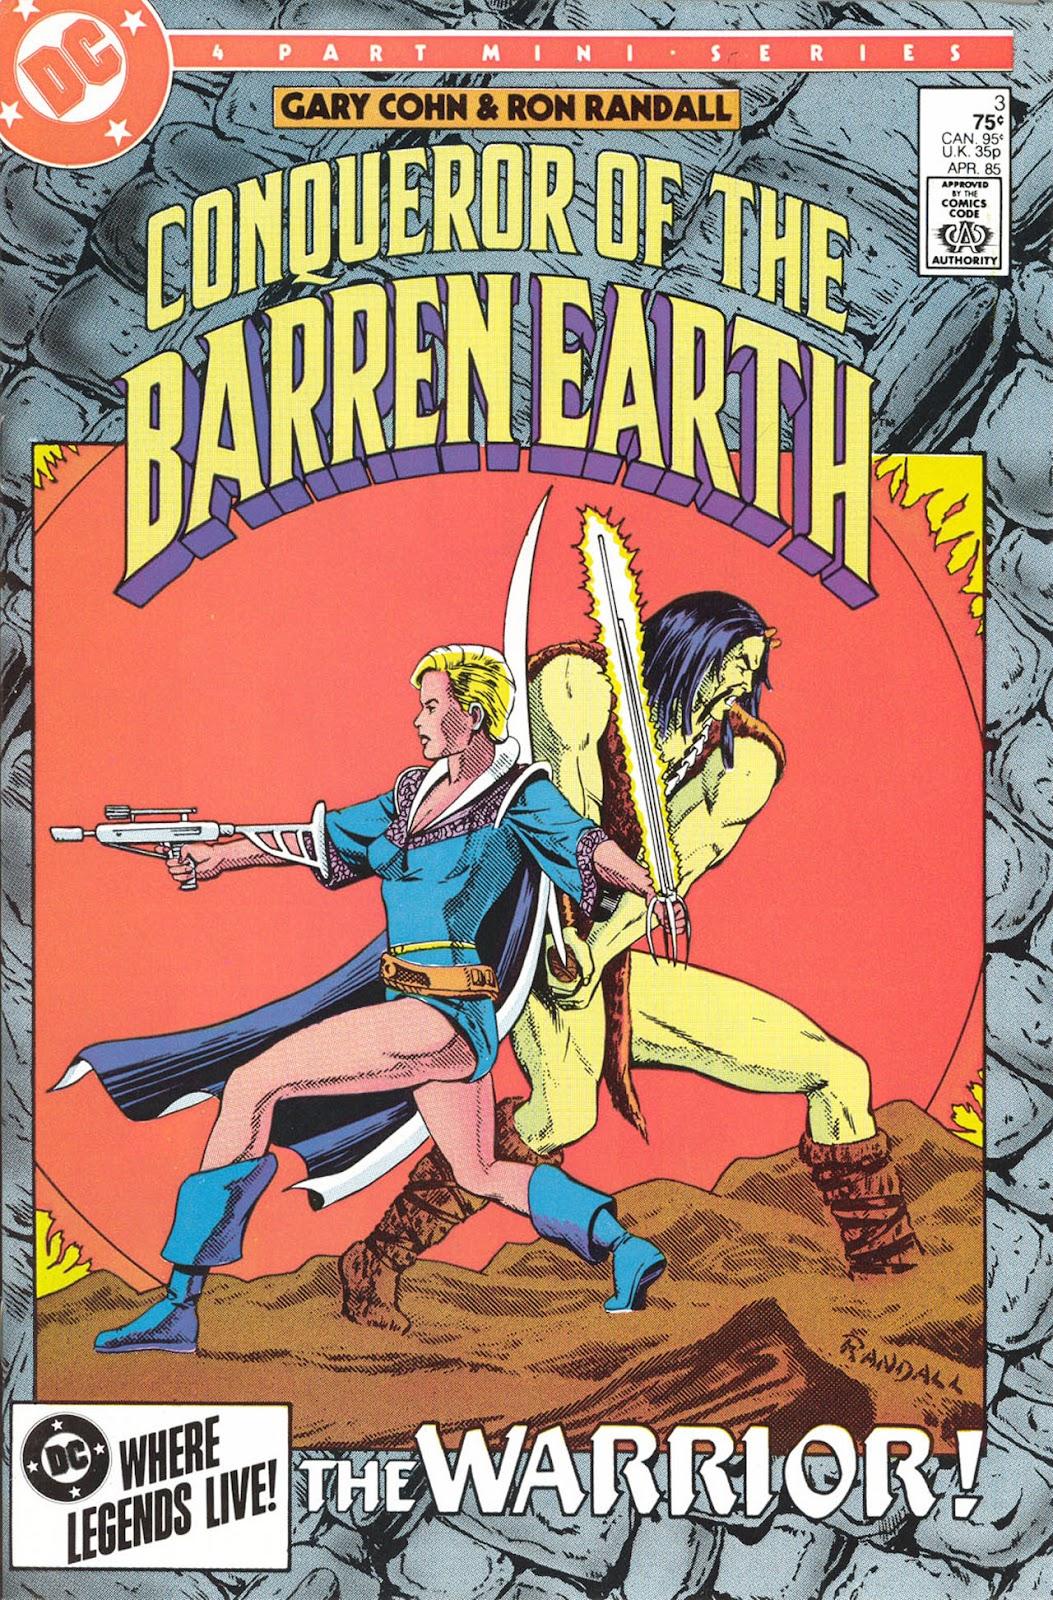 Conqueror of the Barren Earth 3 Page 1